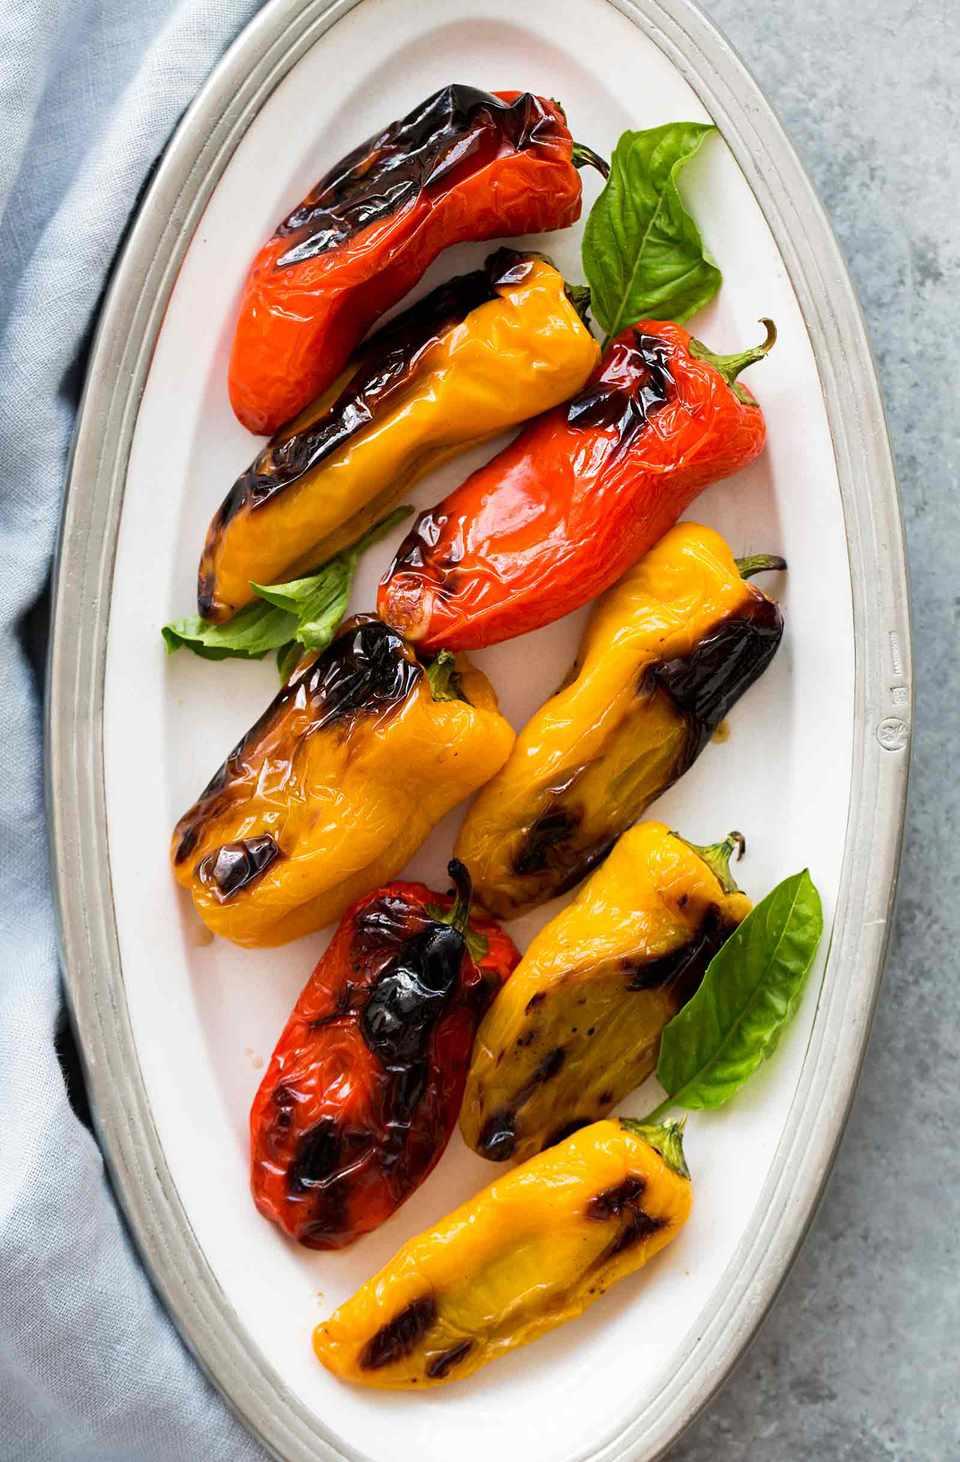 Mozzarella Stuffed Mini Peppers